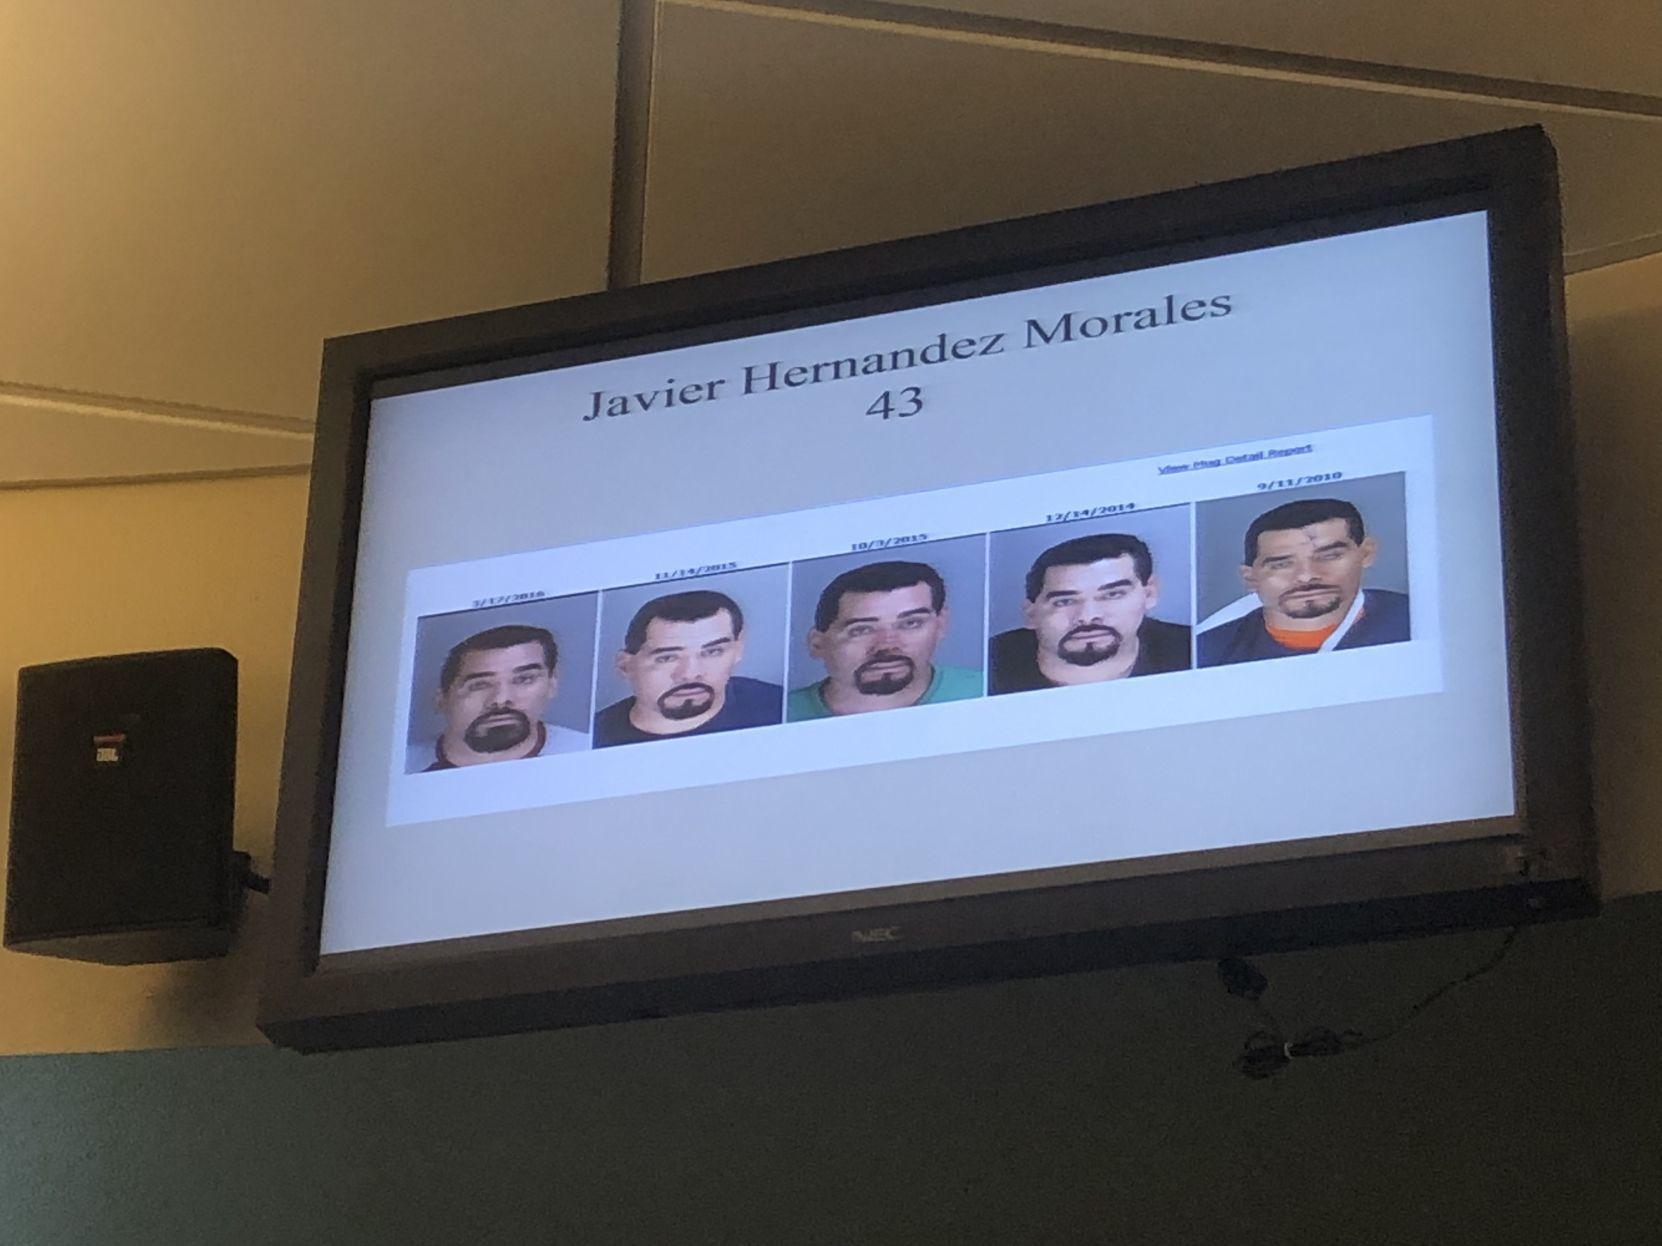 Hernandez Morales (copy)